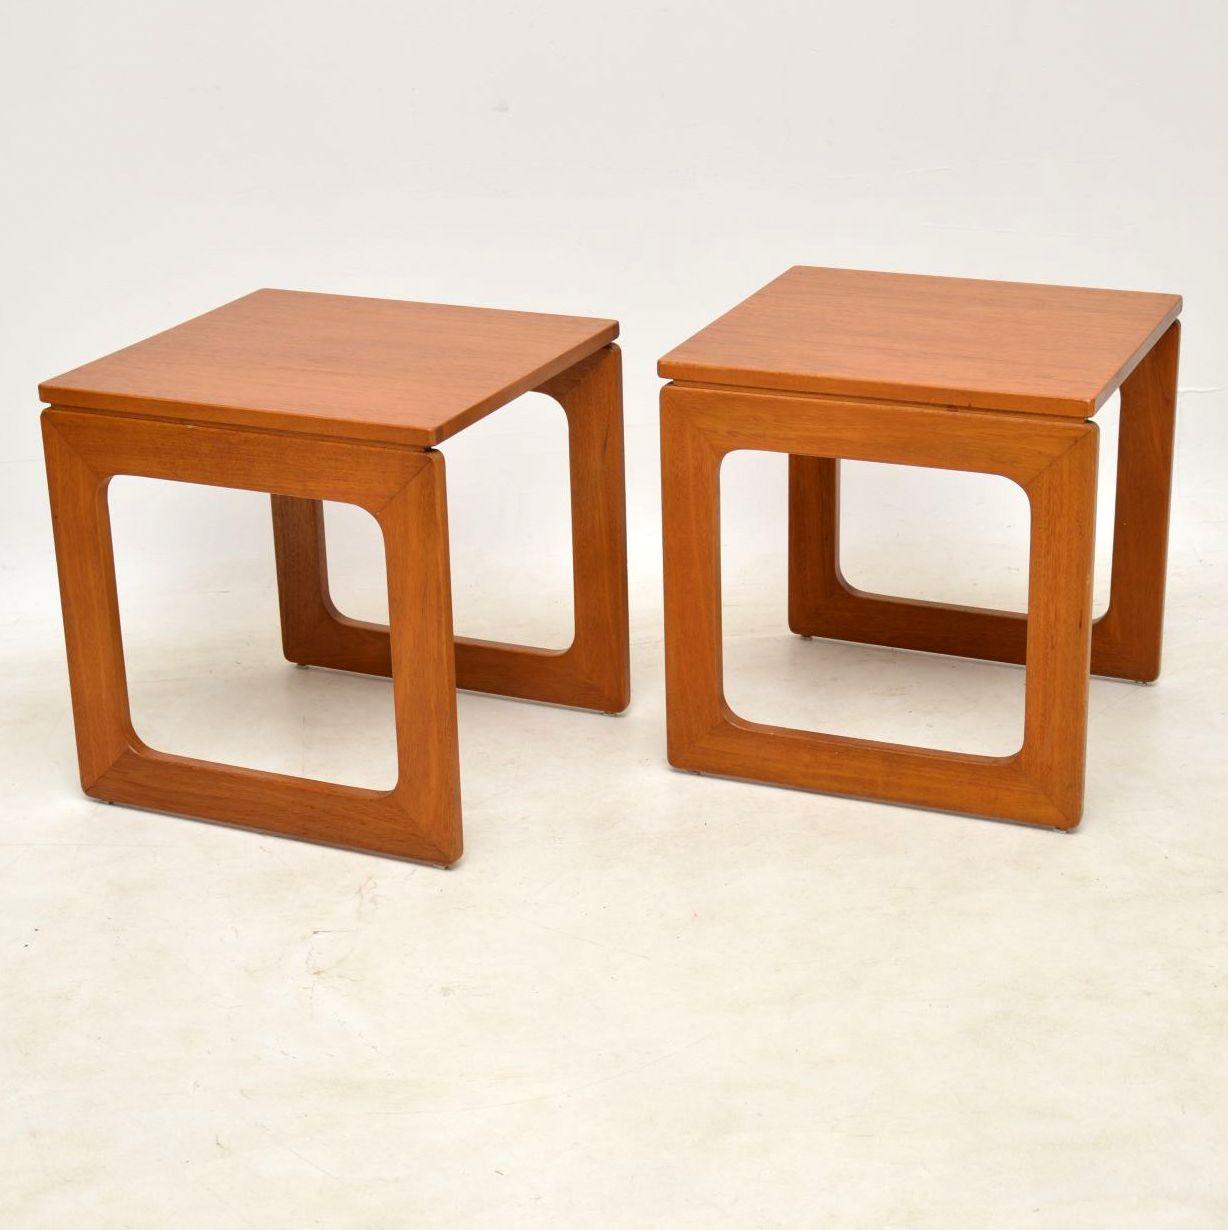 Second Hand Teak Coffee Table: 1960's Vintage Teak Nesting Coffee Table / Side Tables